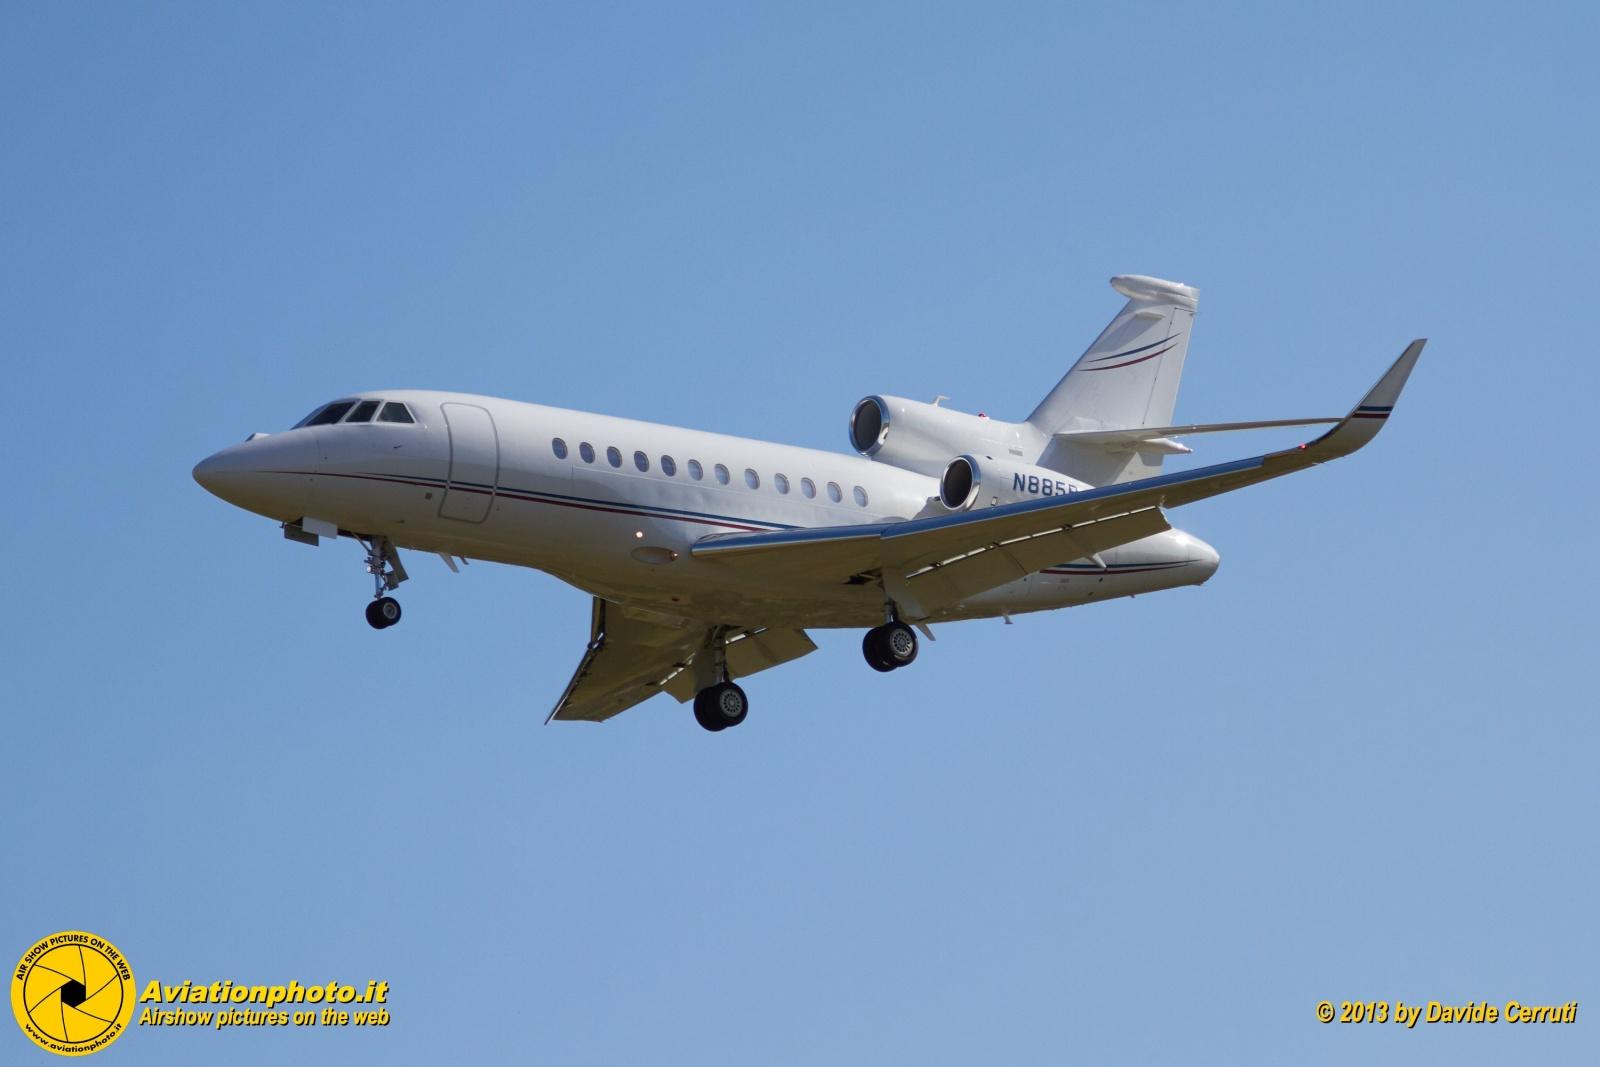 Royal International Air Tattoo 2013 - Friday Arrival